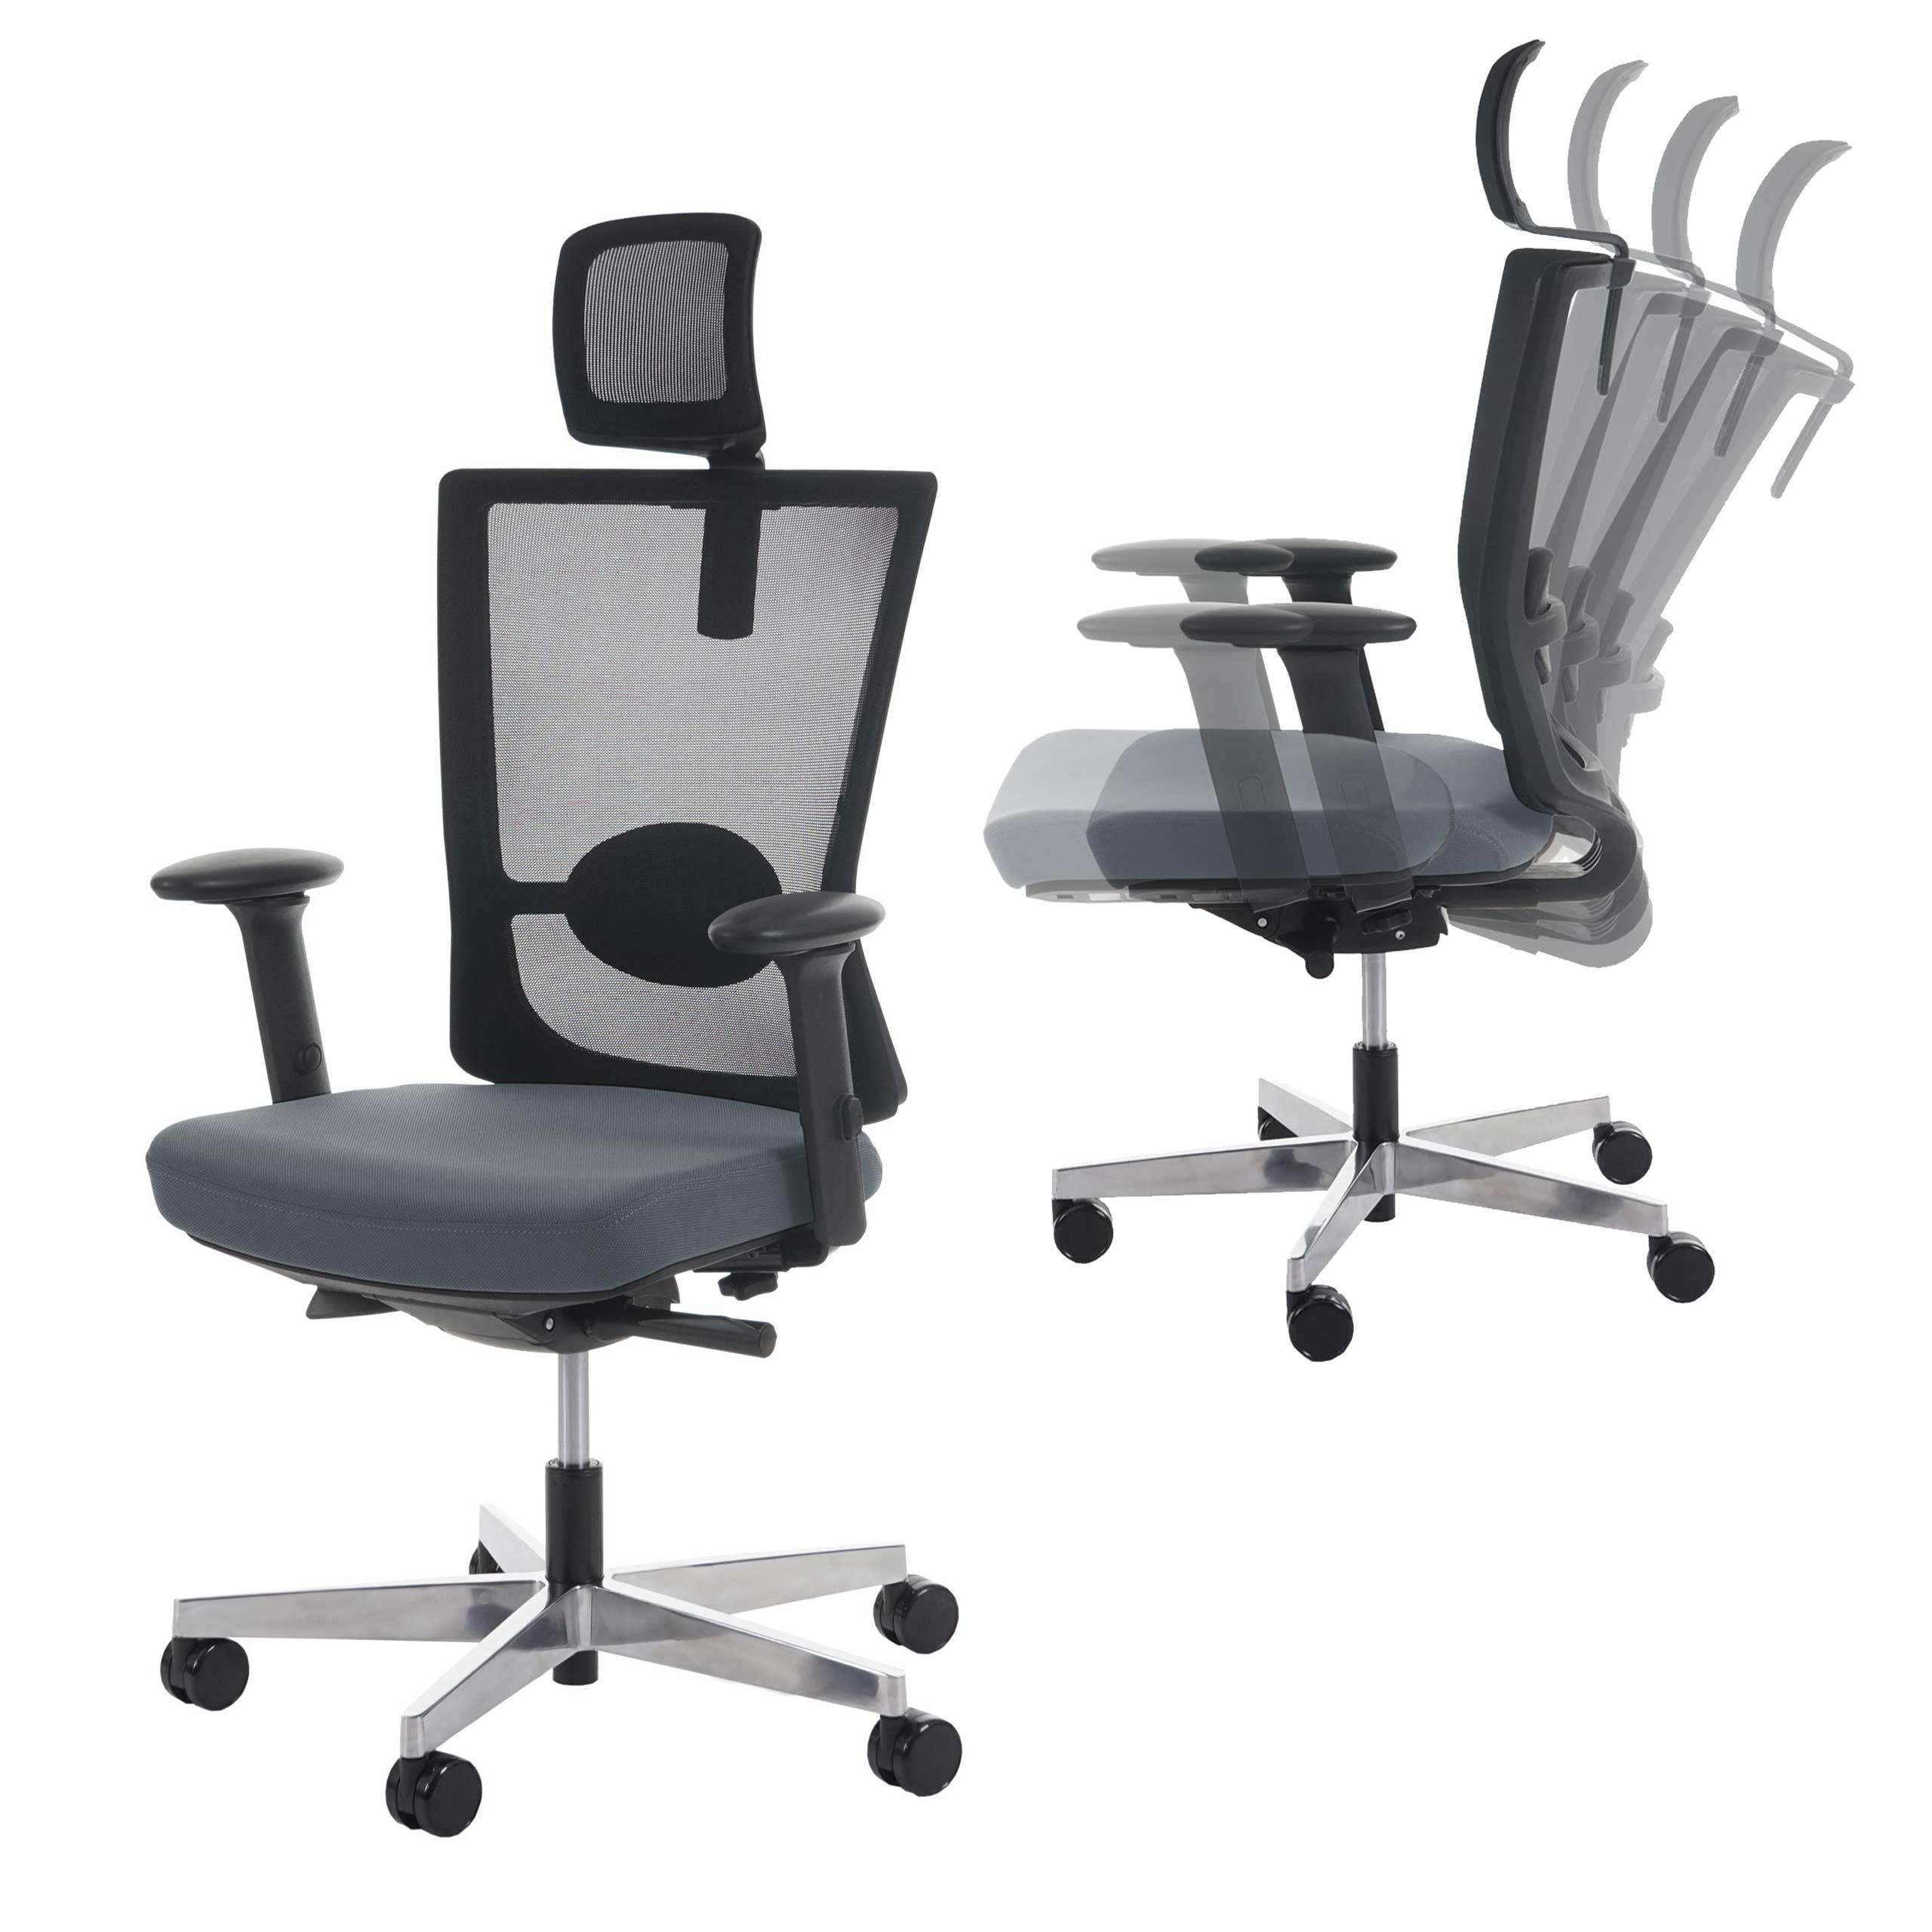 profi b rostuhl belfast schreibtischstuhl drehstuhl ergonomisch grau mit kopfst tze. Black Bedroom Furniture Sets. Home Design Ideas